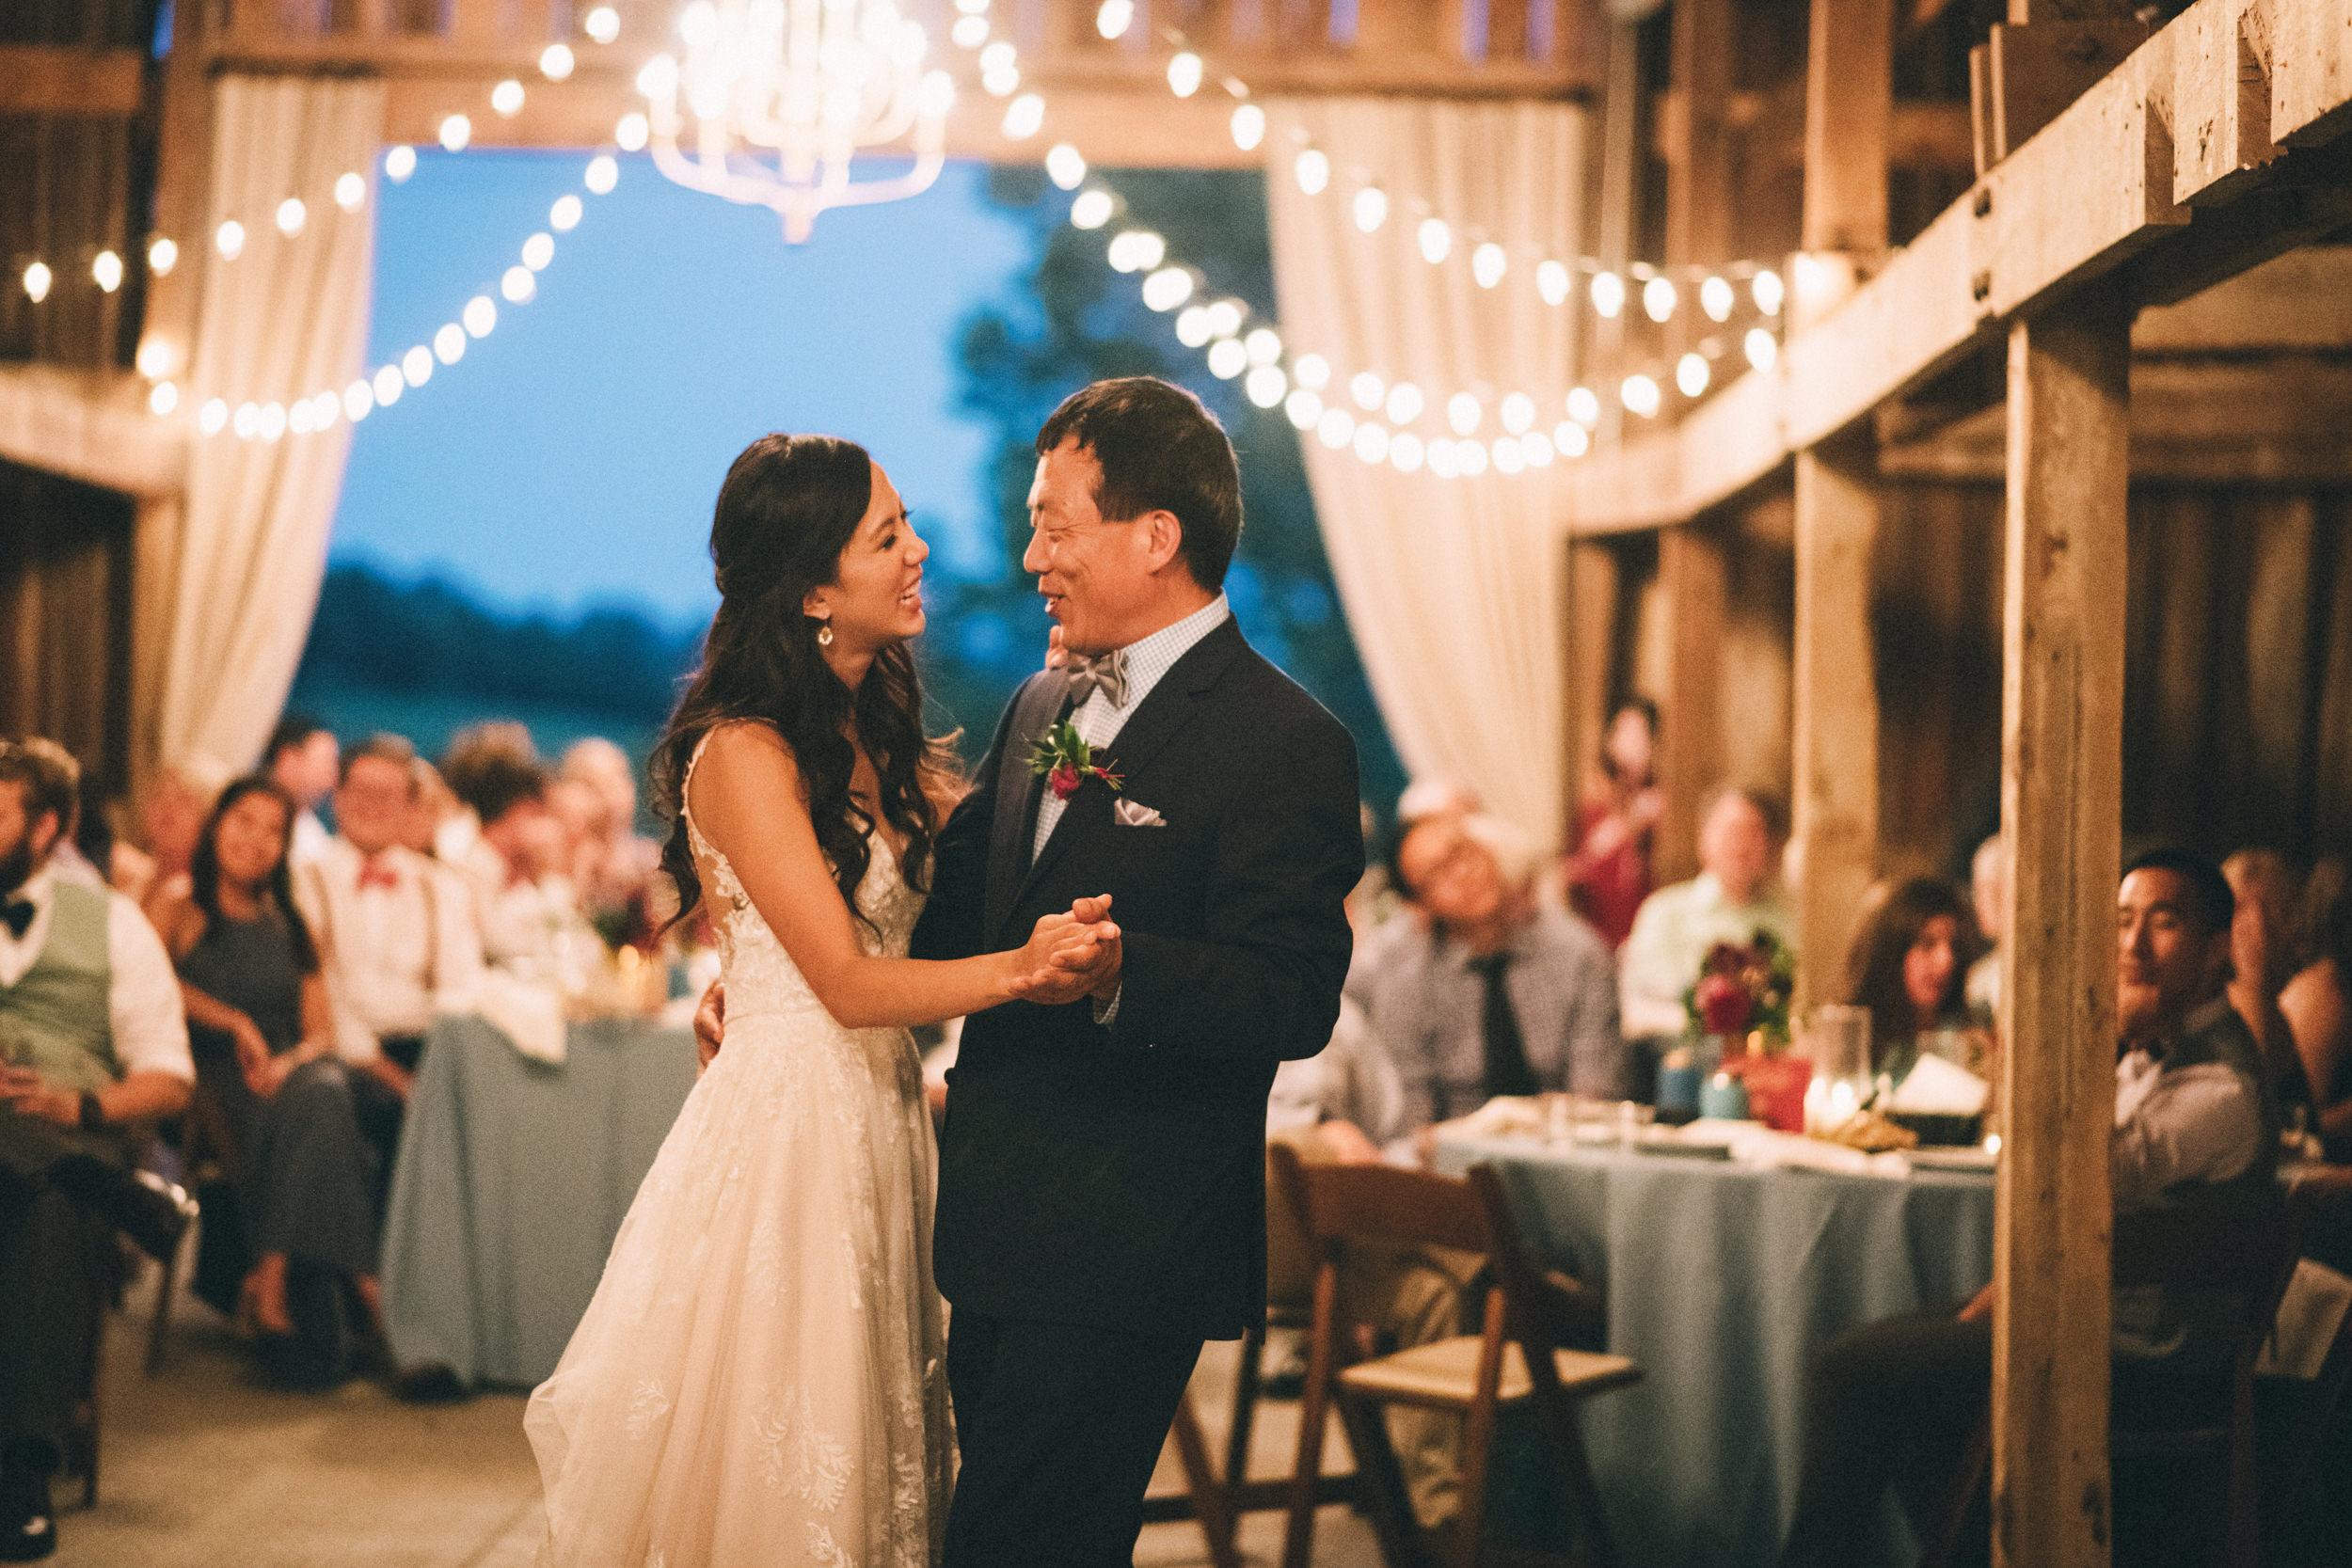 Louisville-Kentucky-Wedding-and-Elopement-Photographer-Sarah-Katherine-Davis-Photography-Summer-Jewel-Toned-Wedding-Chineese-Tea-Ceremony-Warrenwood-Manor-Danville-927.jpg